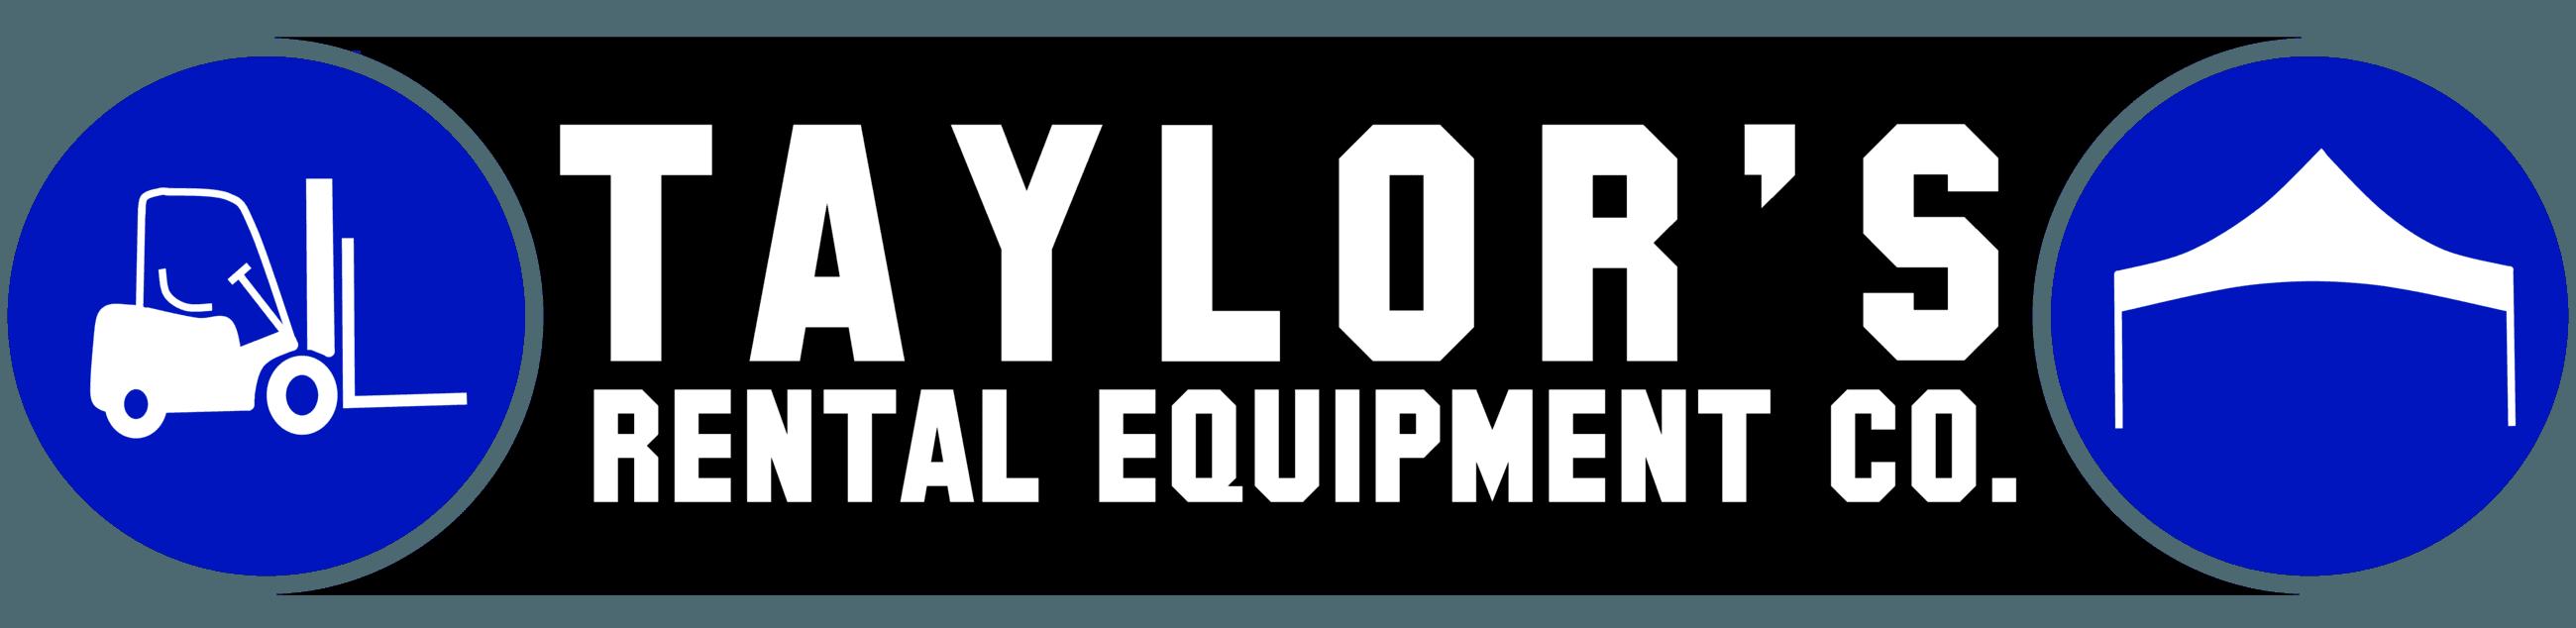 Taylors Rental Equipment